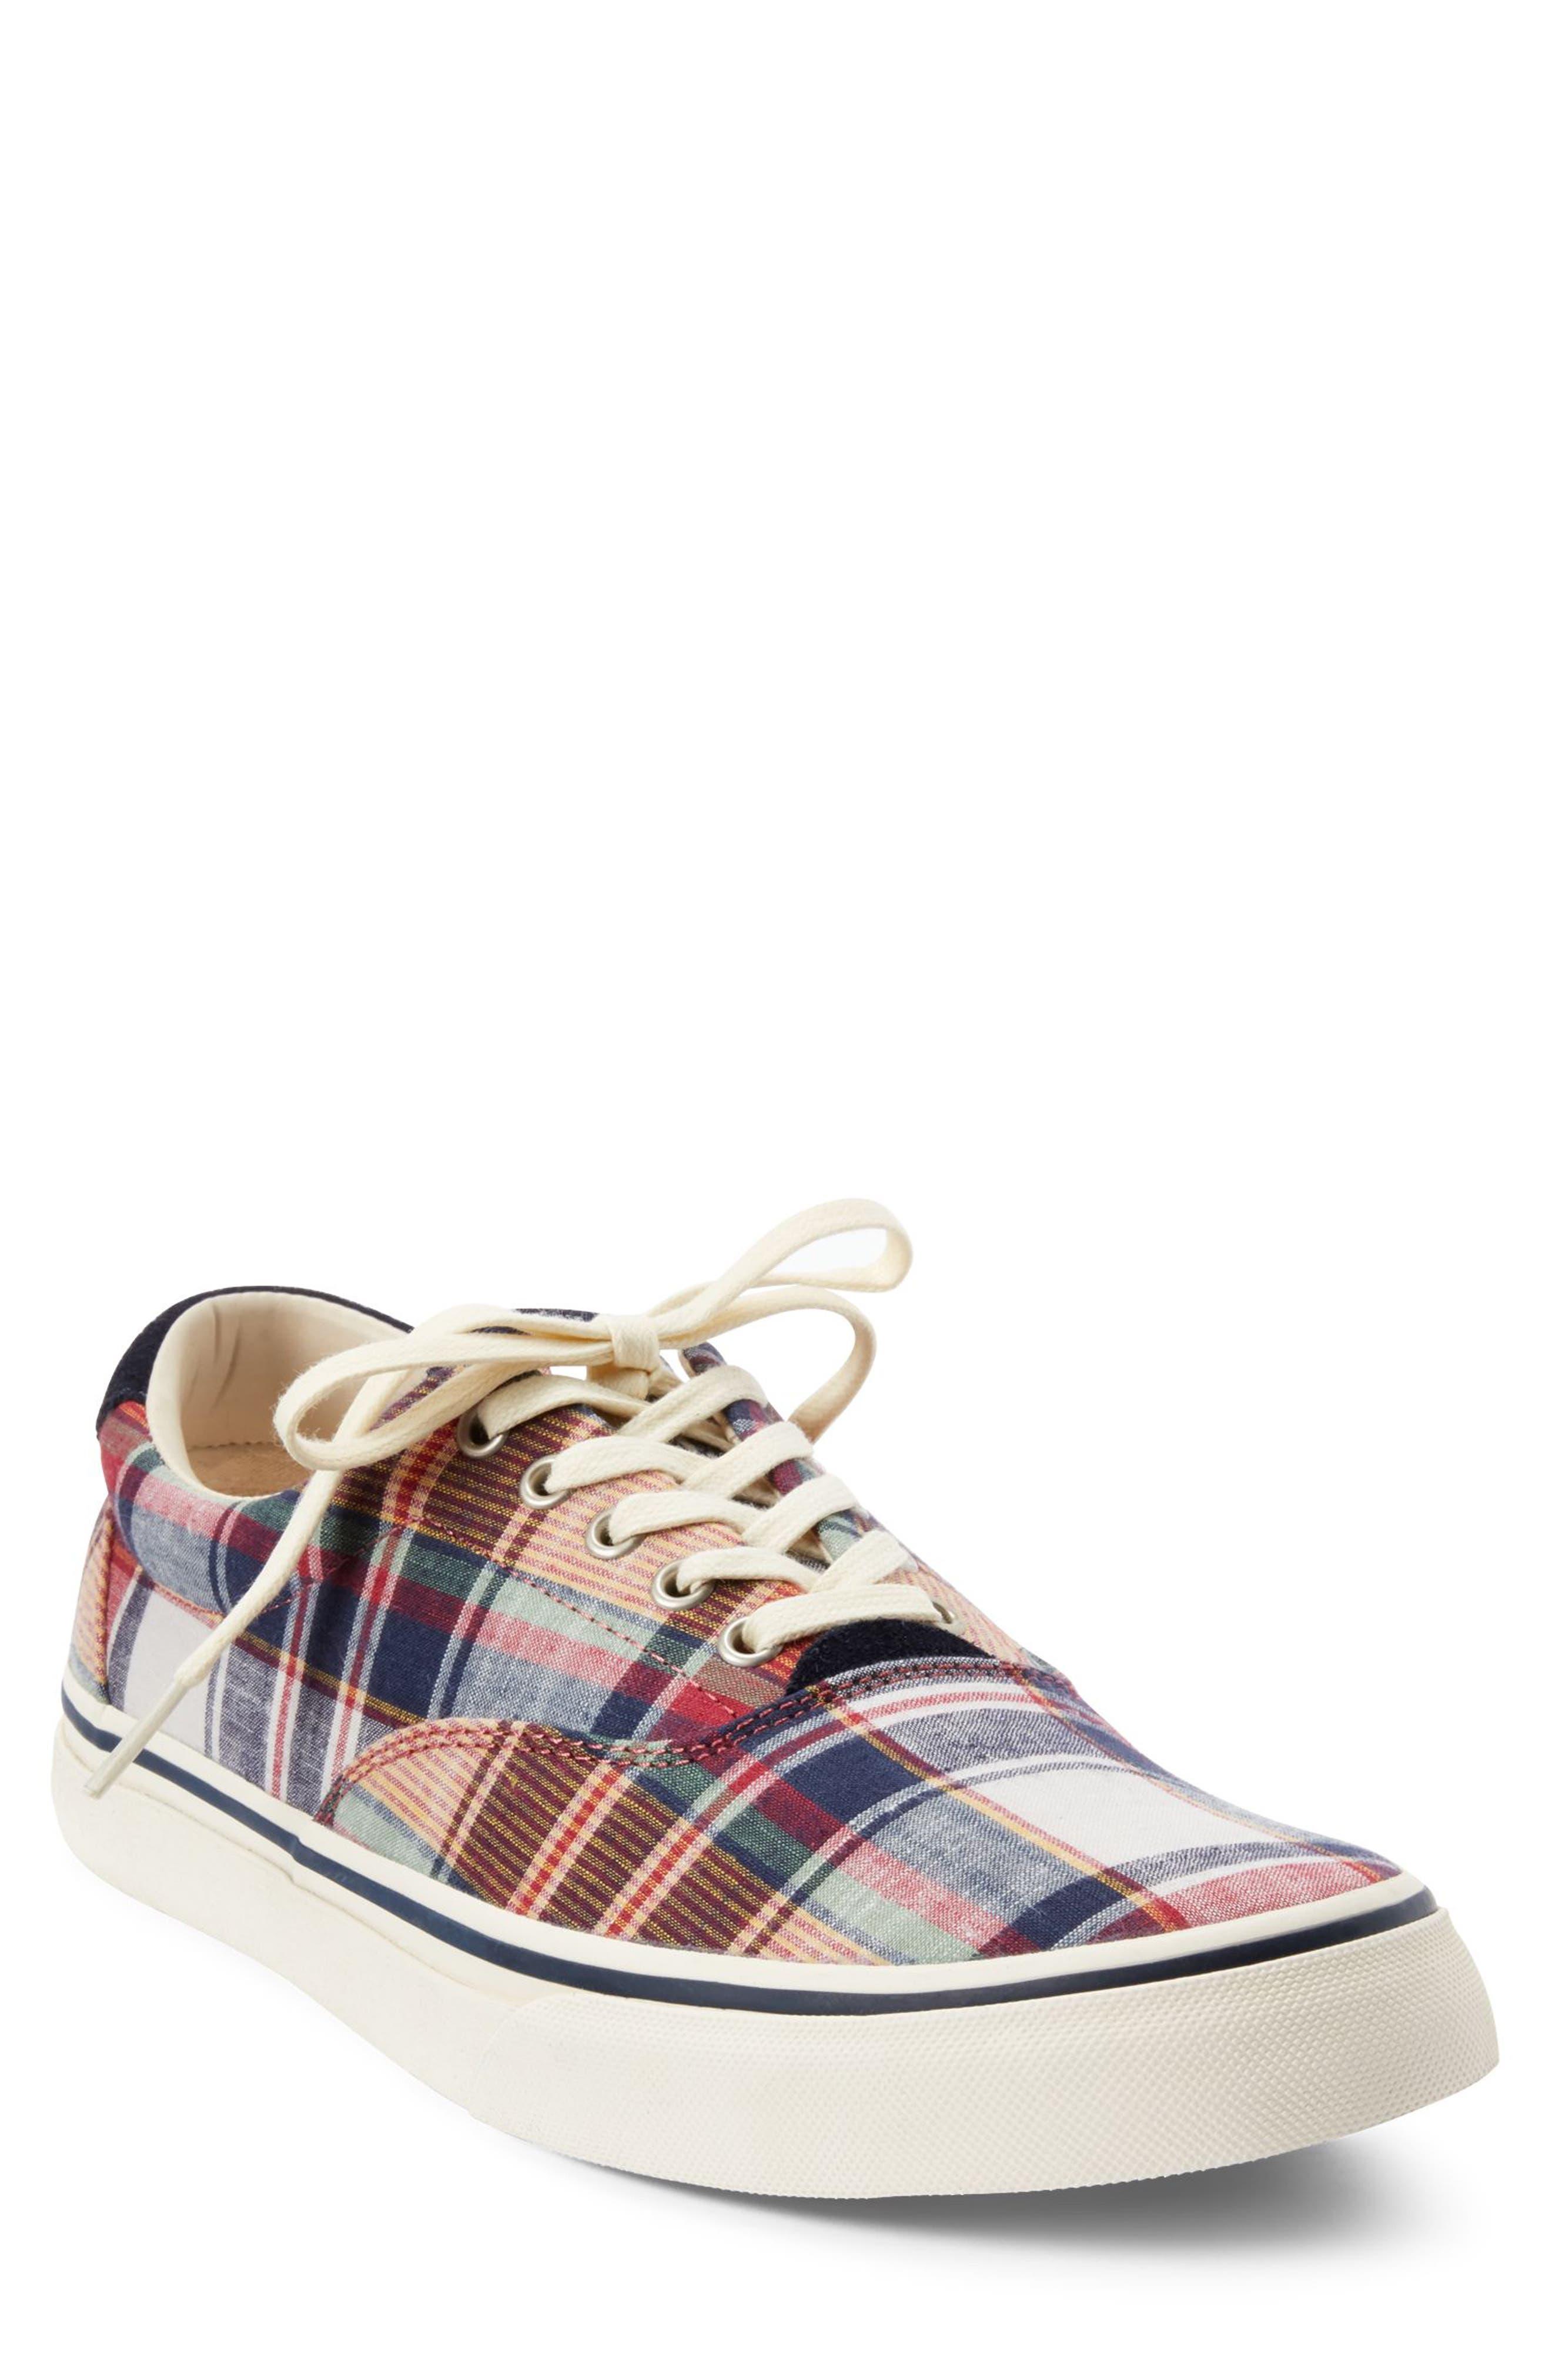 POLO RALPH LAUREN, Thorton III Sneaker, Main thumbnail 1, color, MULTI COLOR FABRIC